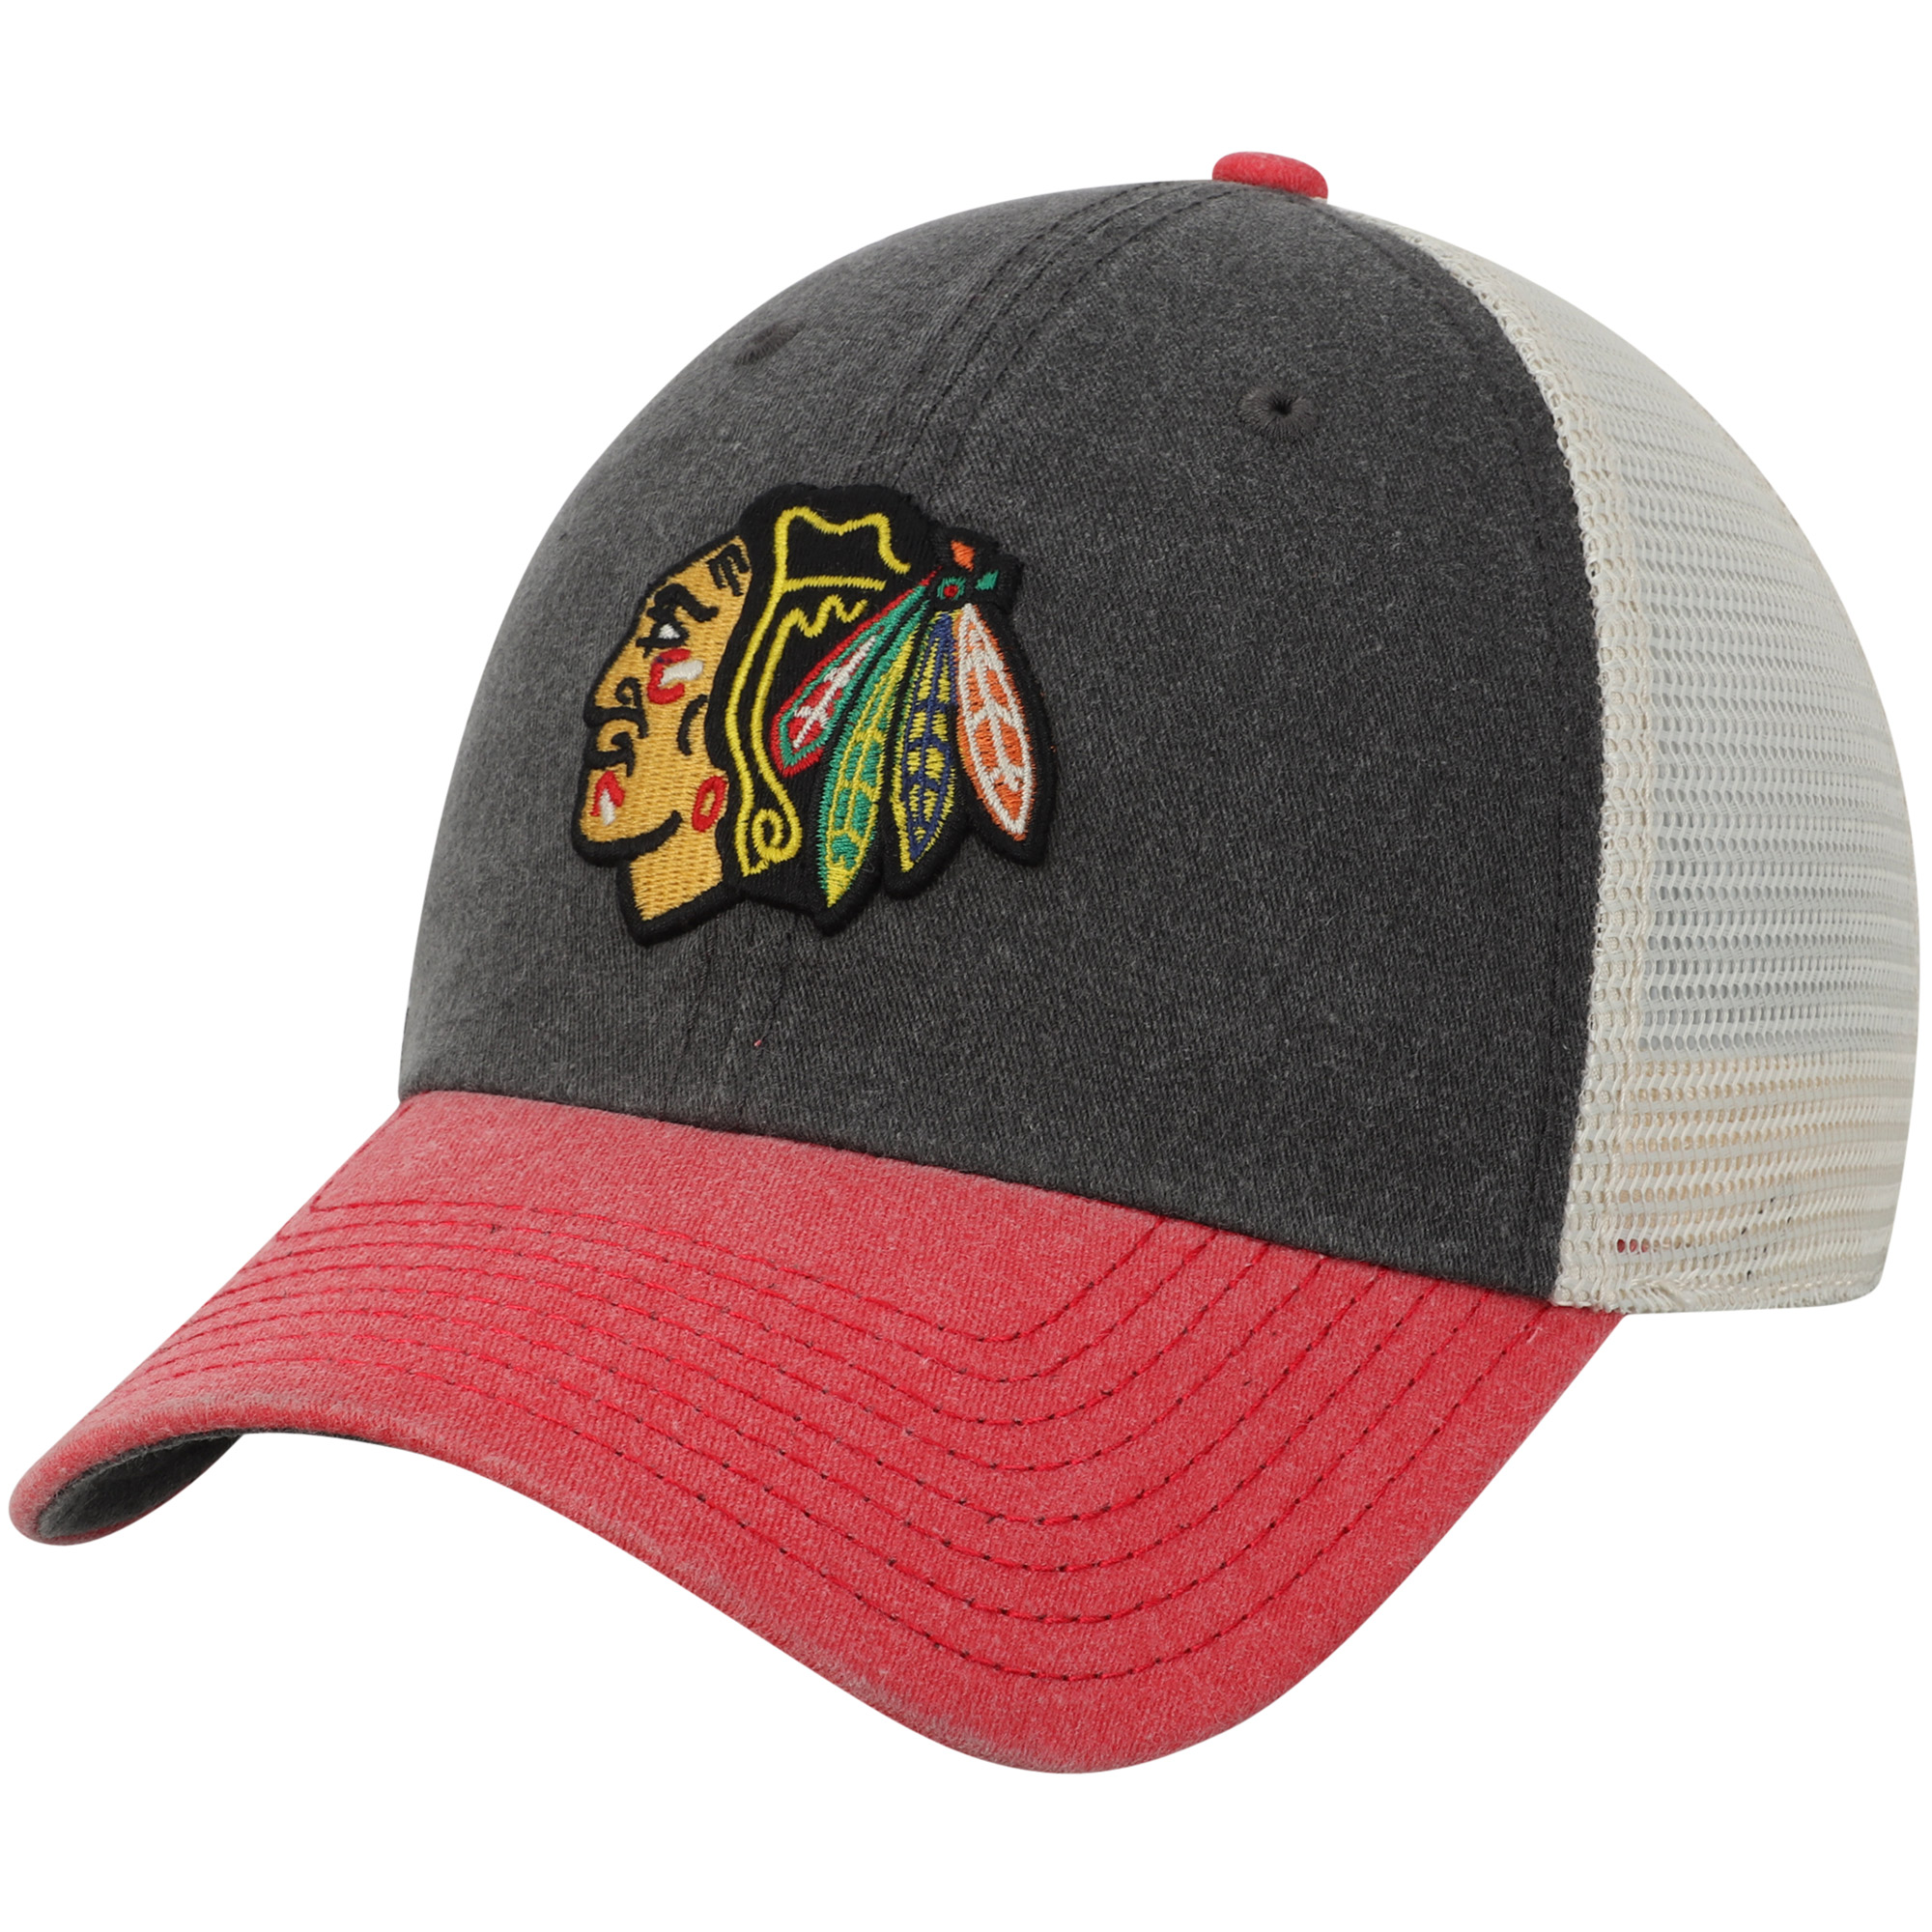 Chicago Blackhawks American Needle Hanover Unstructured Adjustable Hat - Black/Red - OSFA